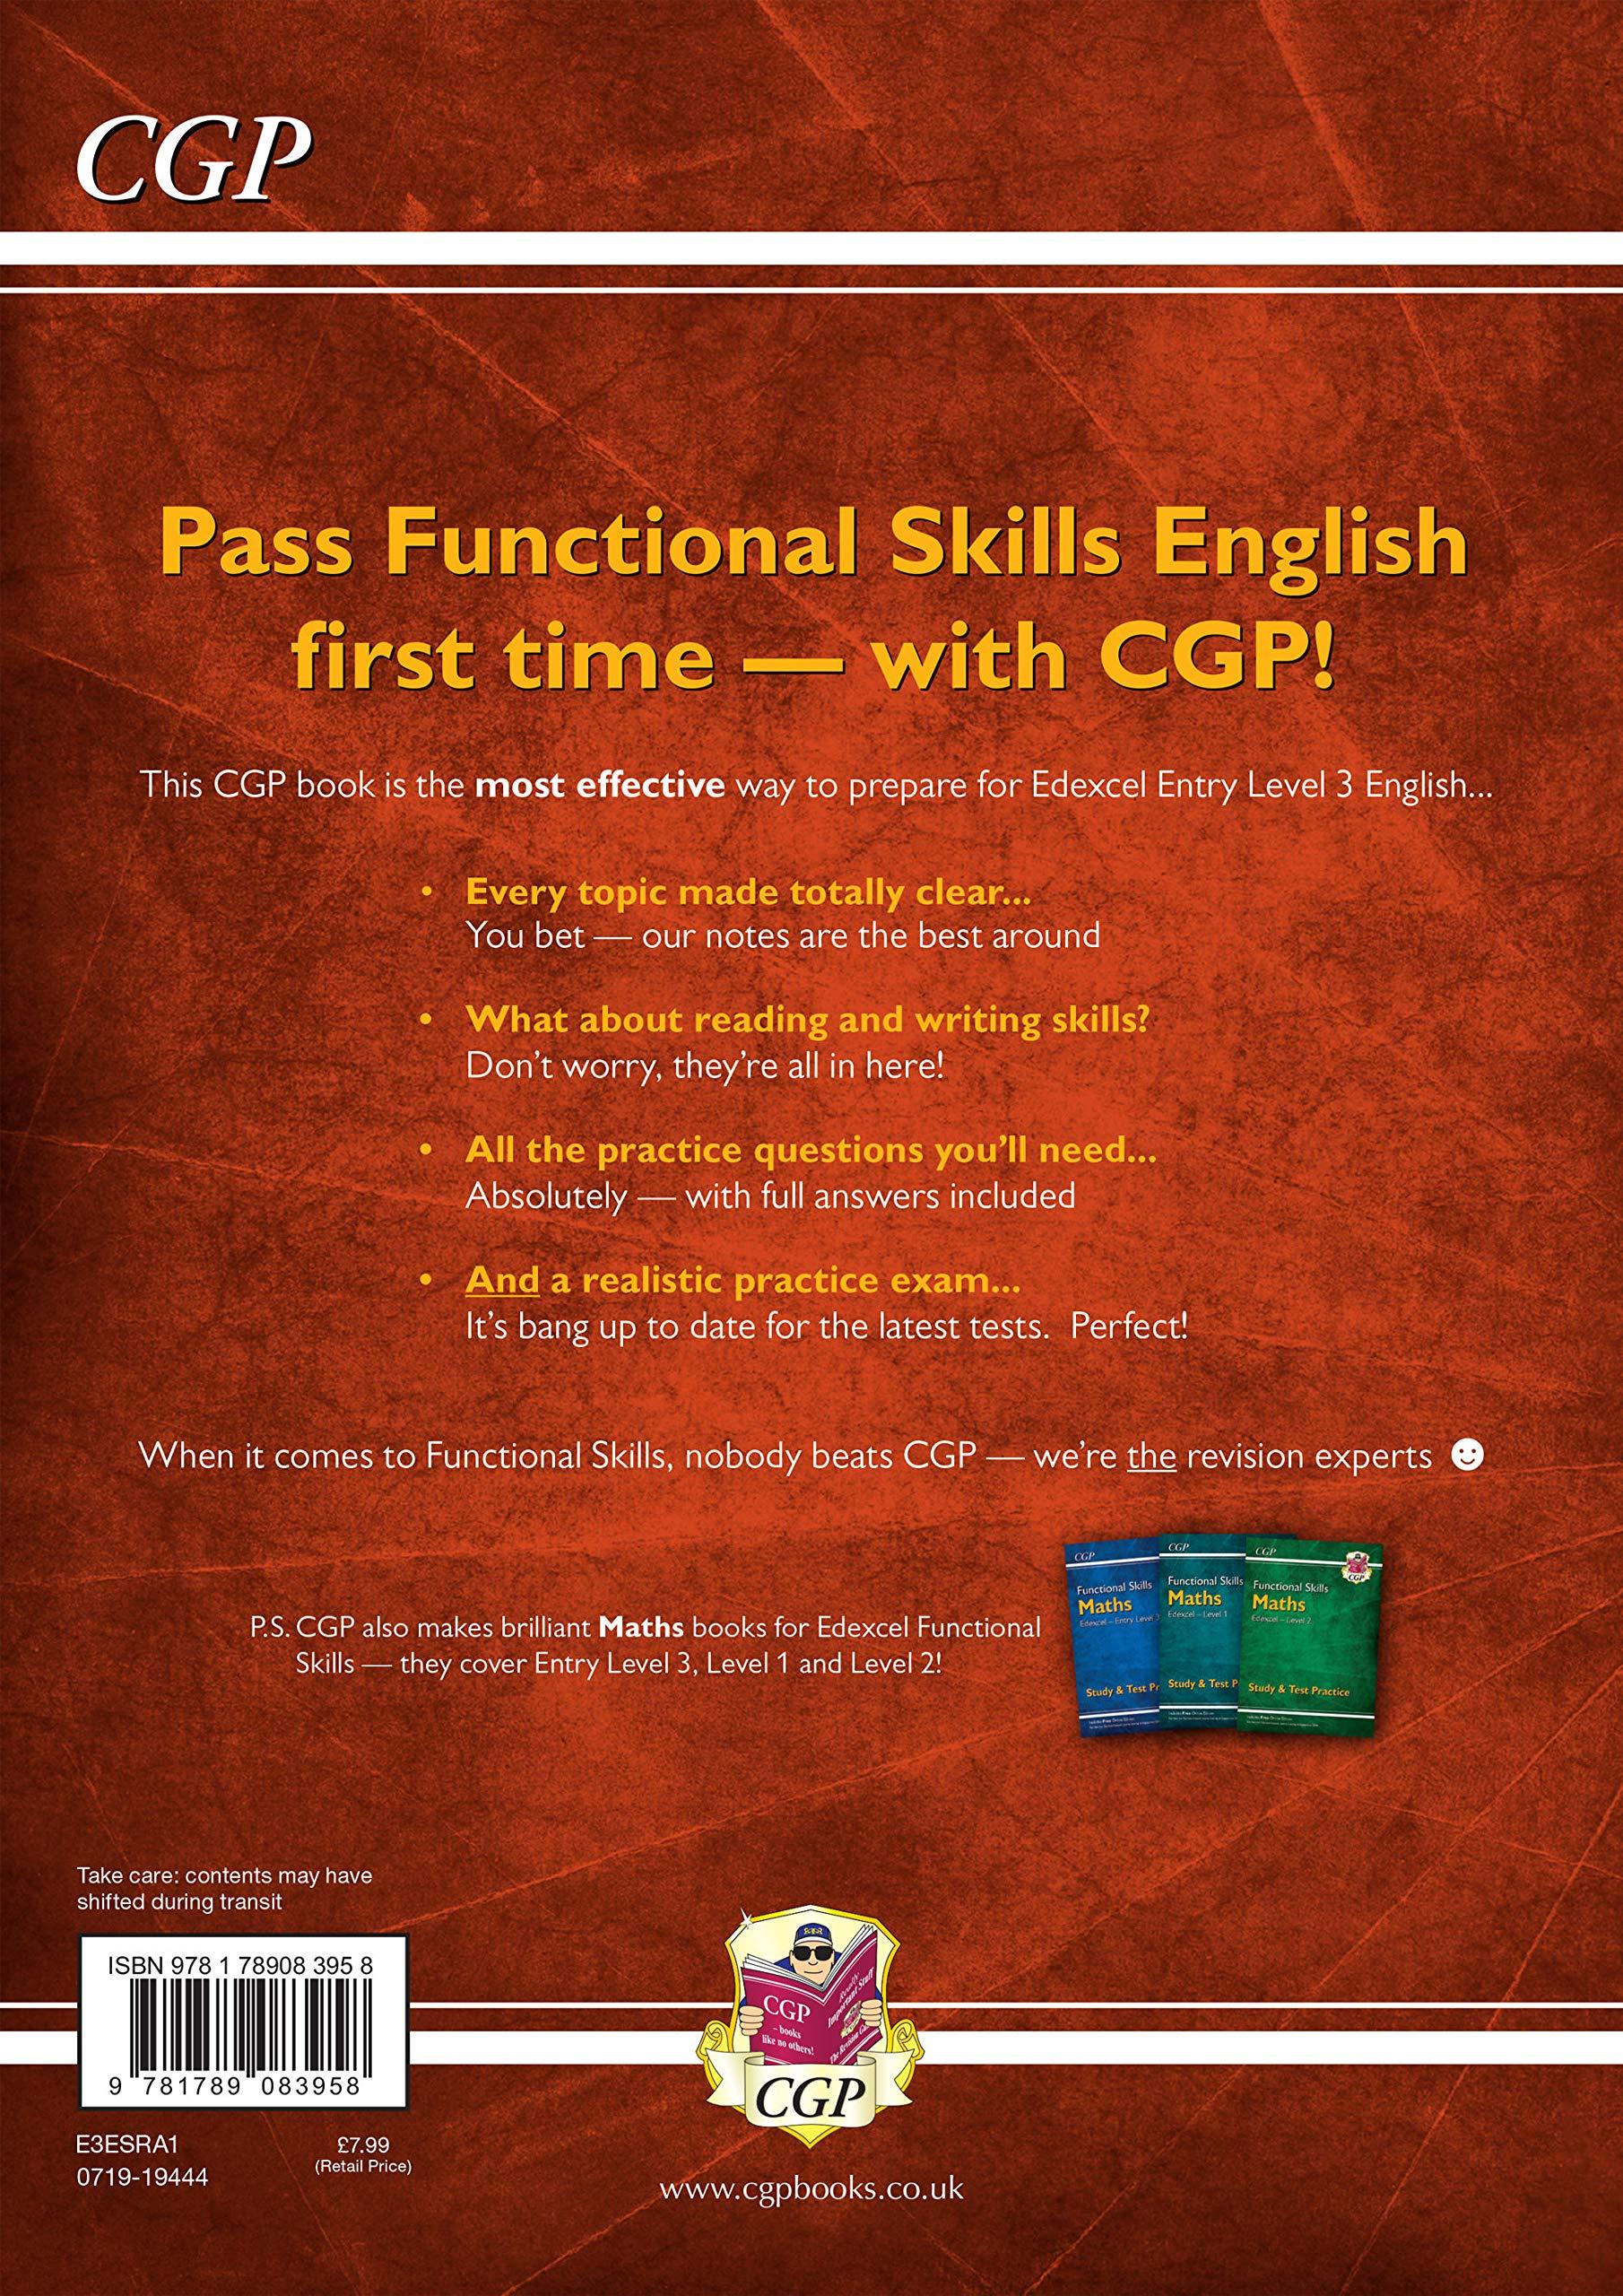 New Functional Skills English: Edexcel Level 1 - Study & Test Practice (for  2020 & beyond) (CGP Functional Skills): Amazon.co.uk: CGP Books, CGP Books:  9781789083972: Books